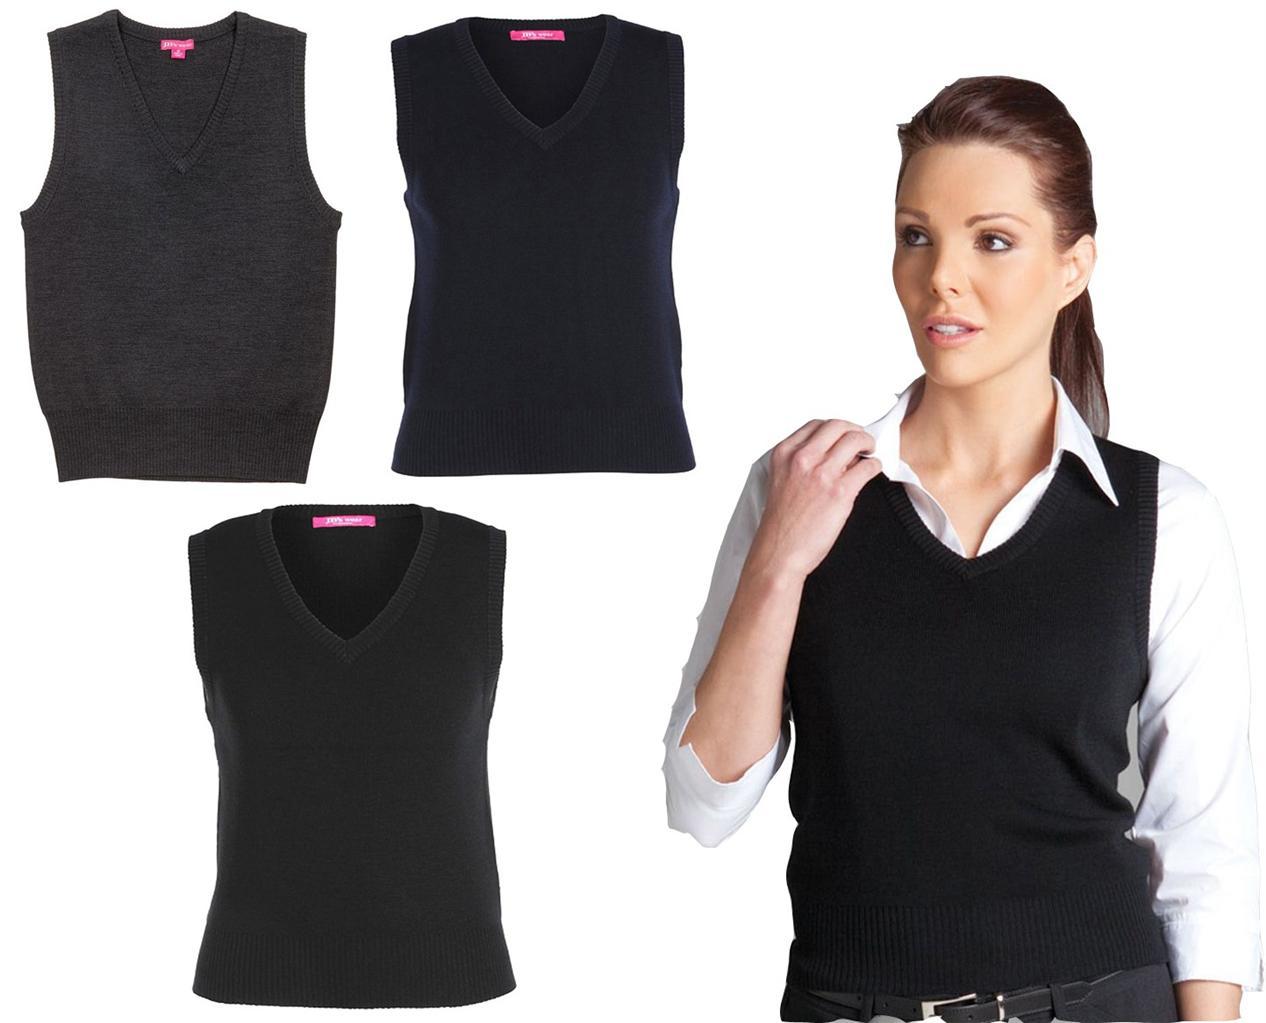 Knitting Pattern For Ladies Vest Top : Ladies Knitted Vest ~ JBs Wear 6V1 ~ Womens V-Neck knit ...